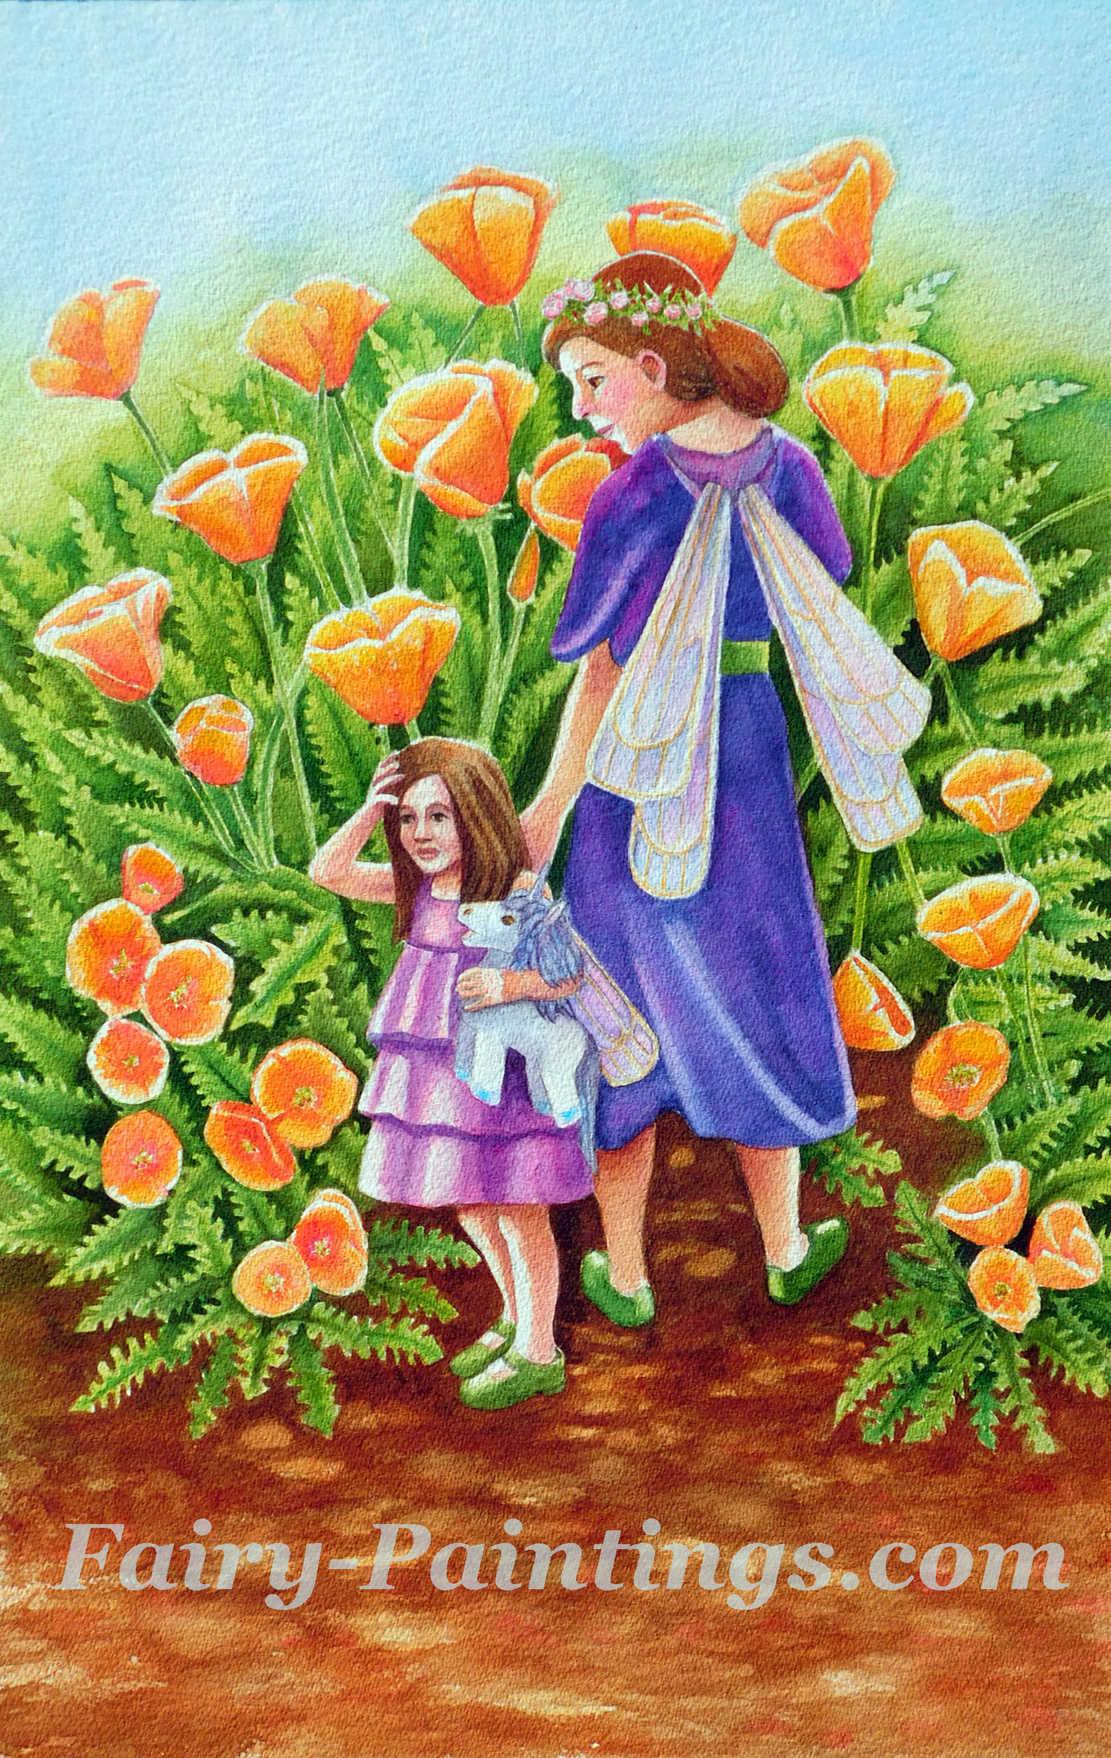 Walking Through Poppies Original Fiary Art By Rachel